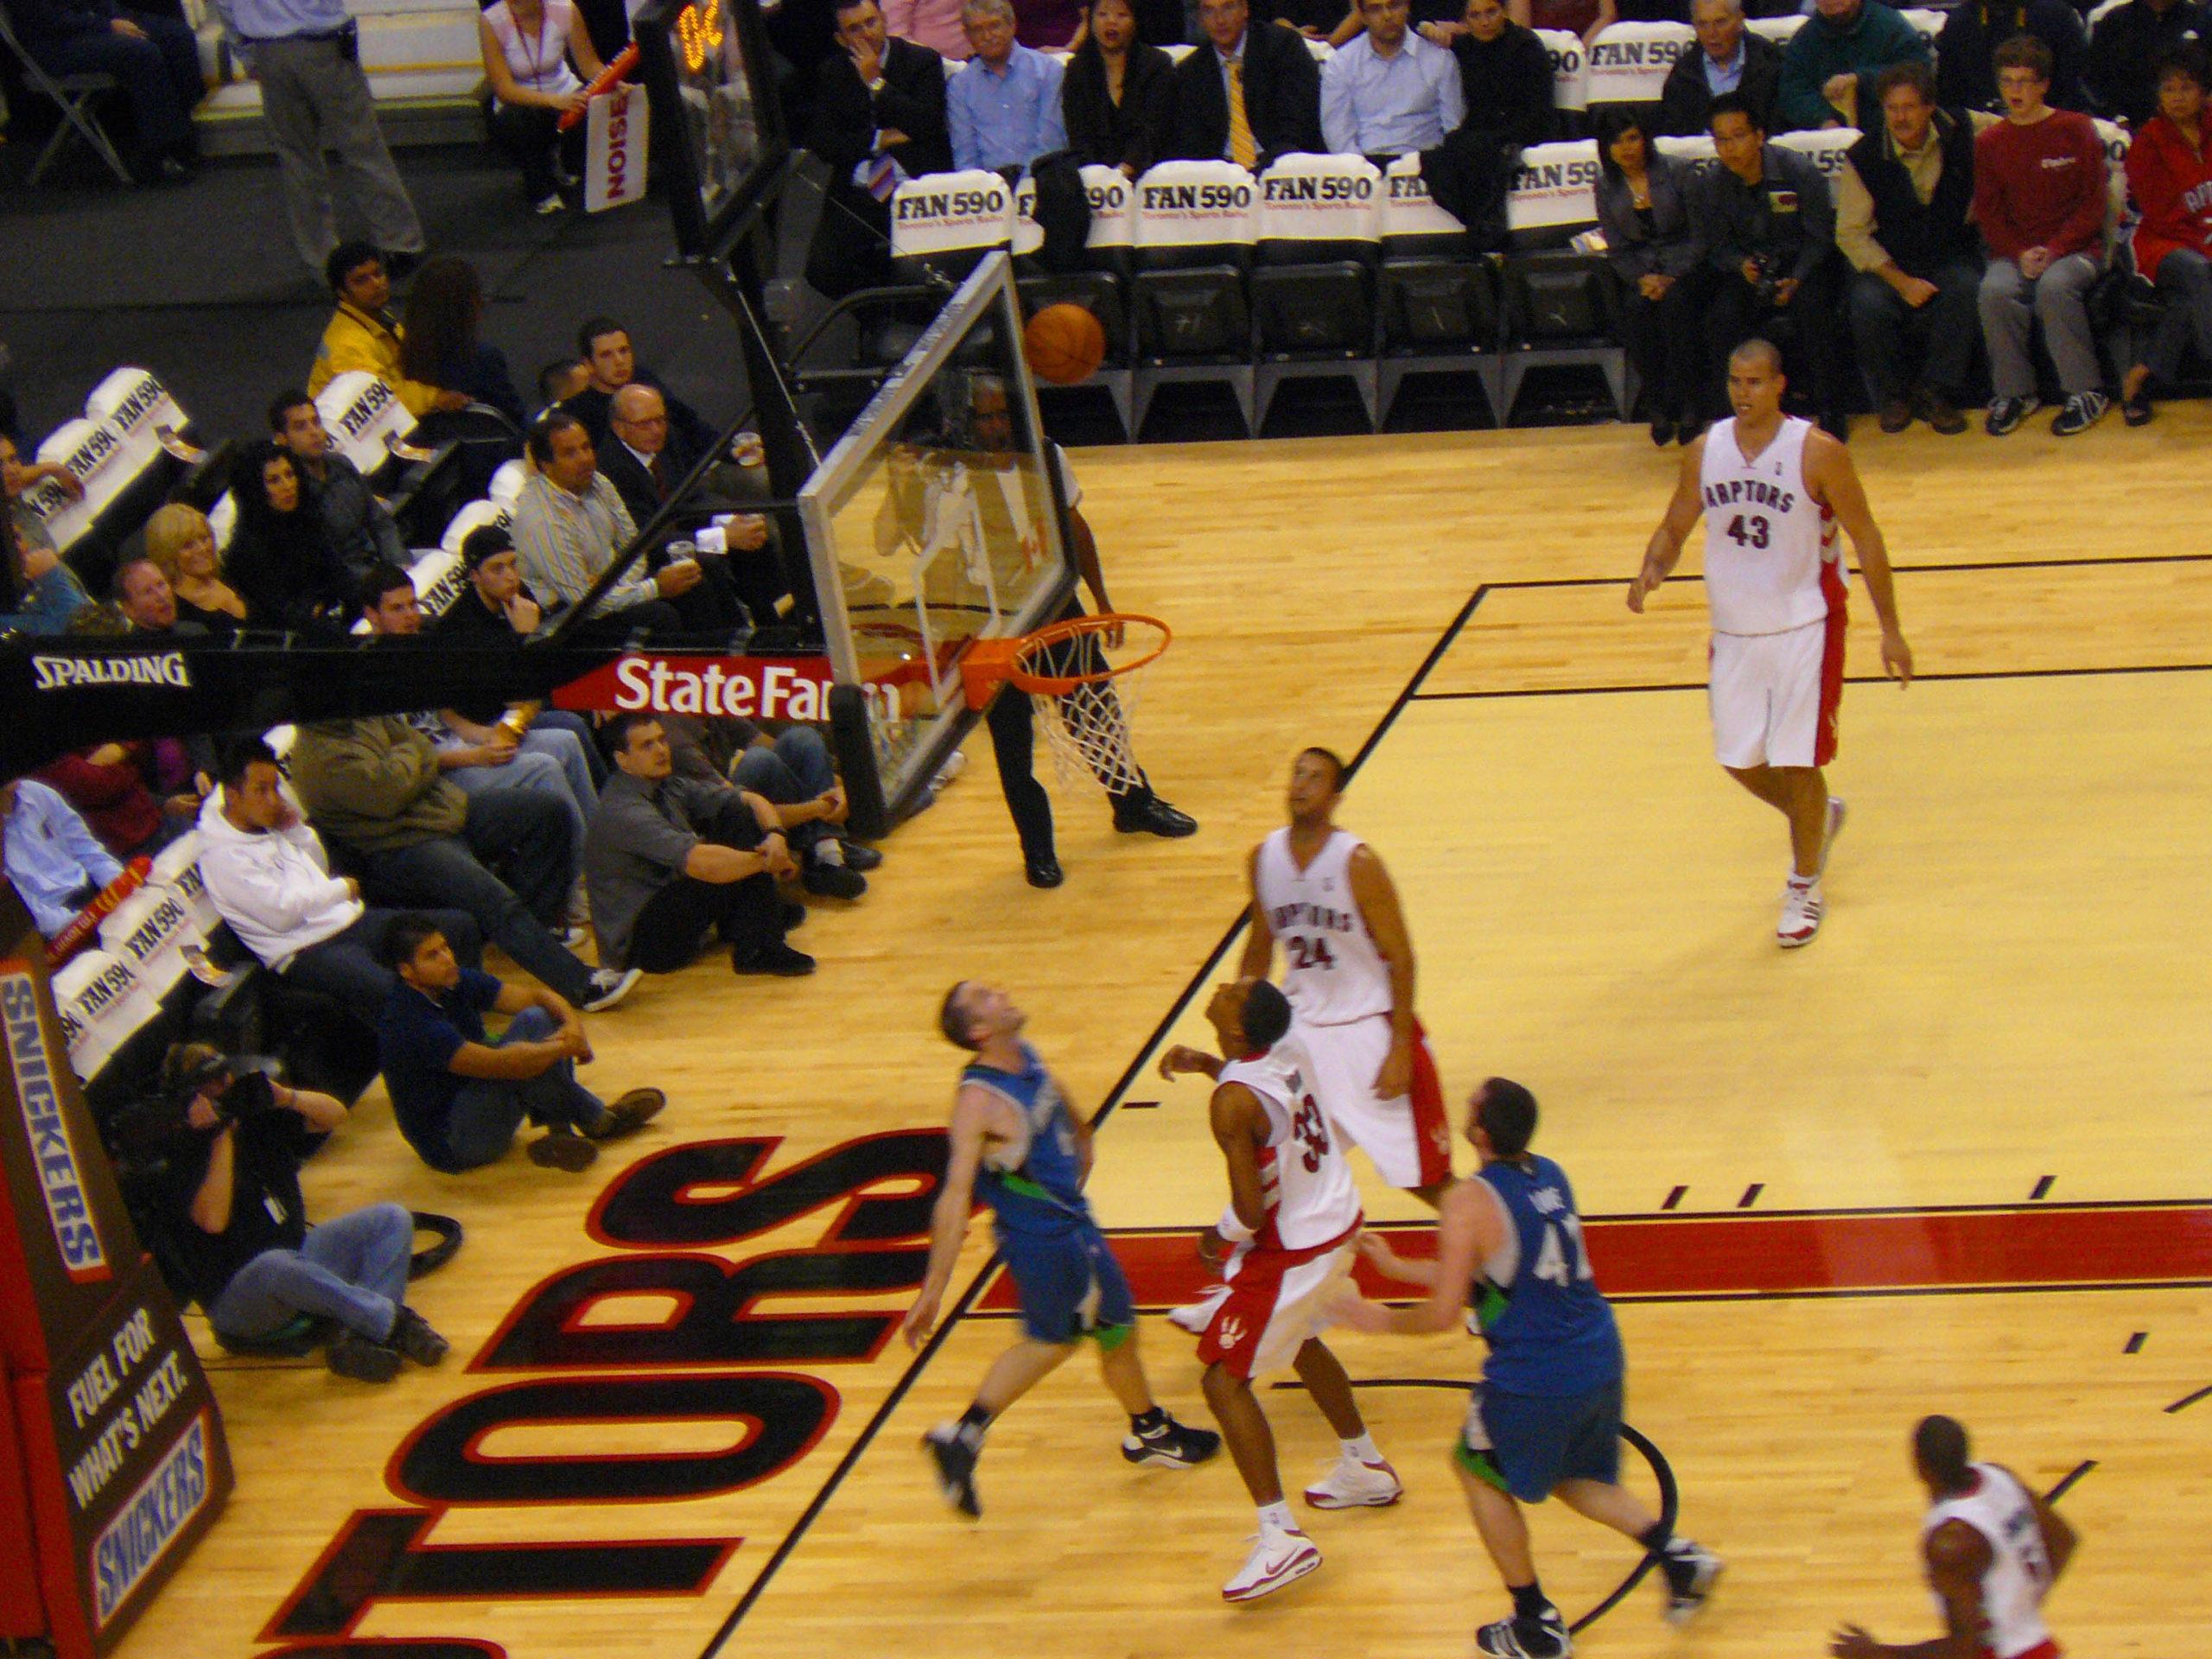 SportsTips' Crazy Predictions For the Upcoming NBA Season